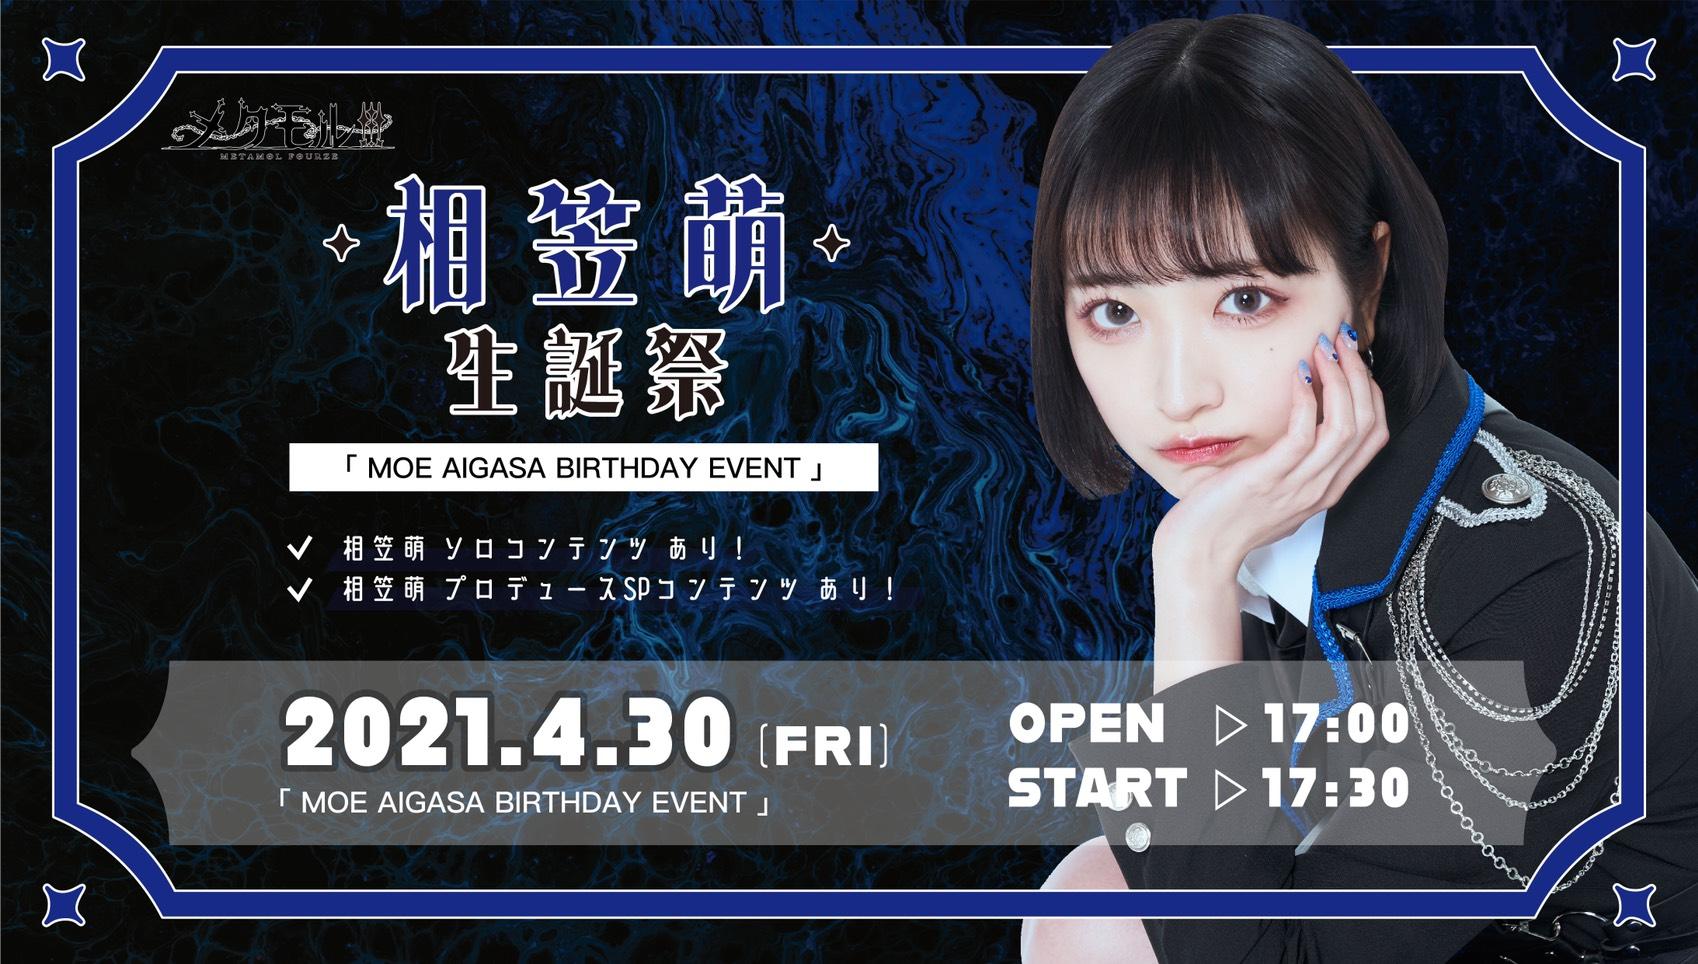 ~Aigasa Moe Birthday Event~